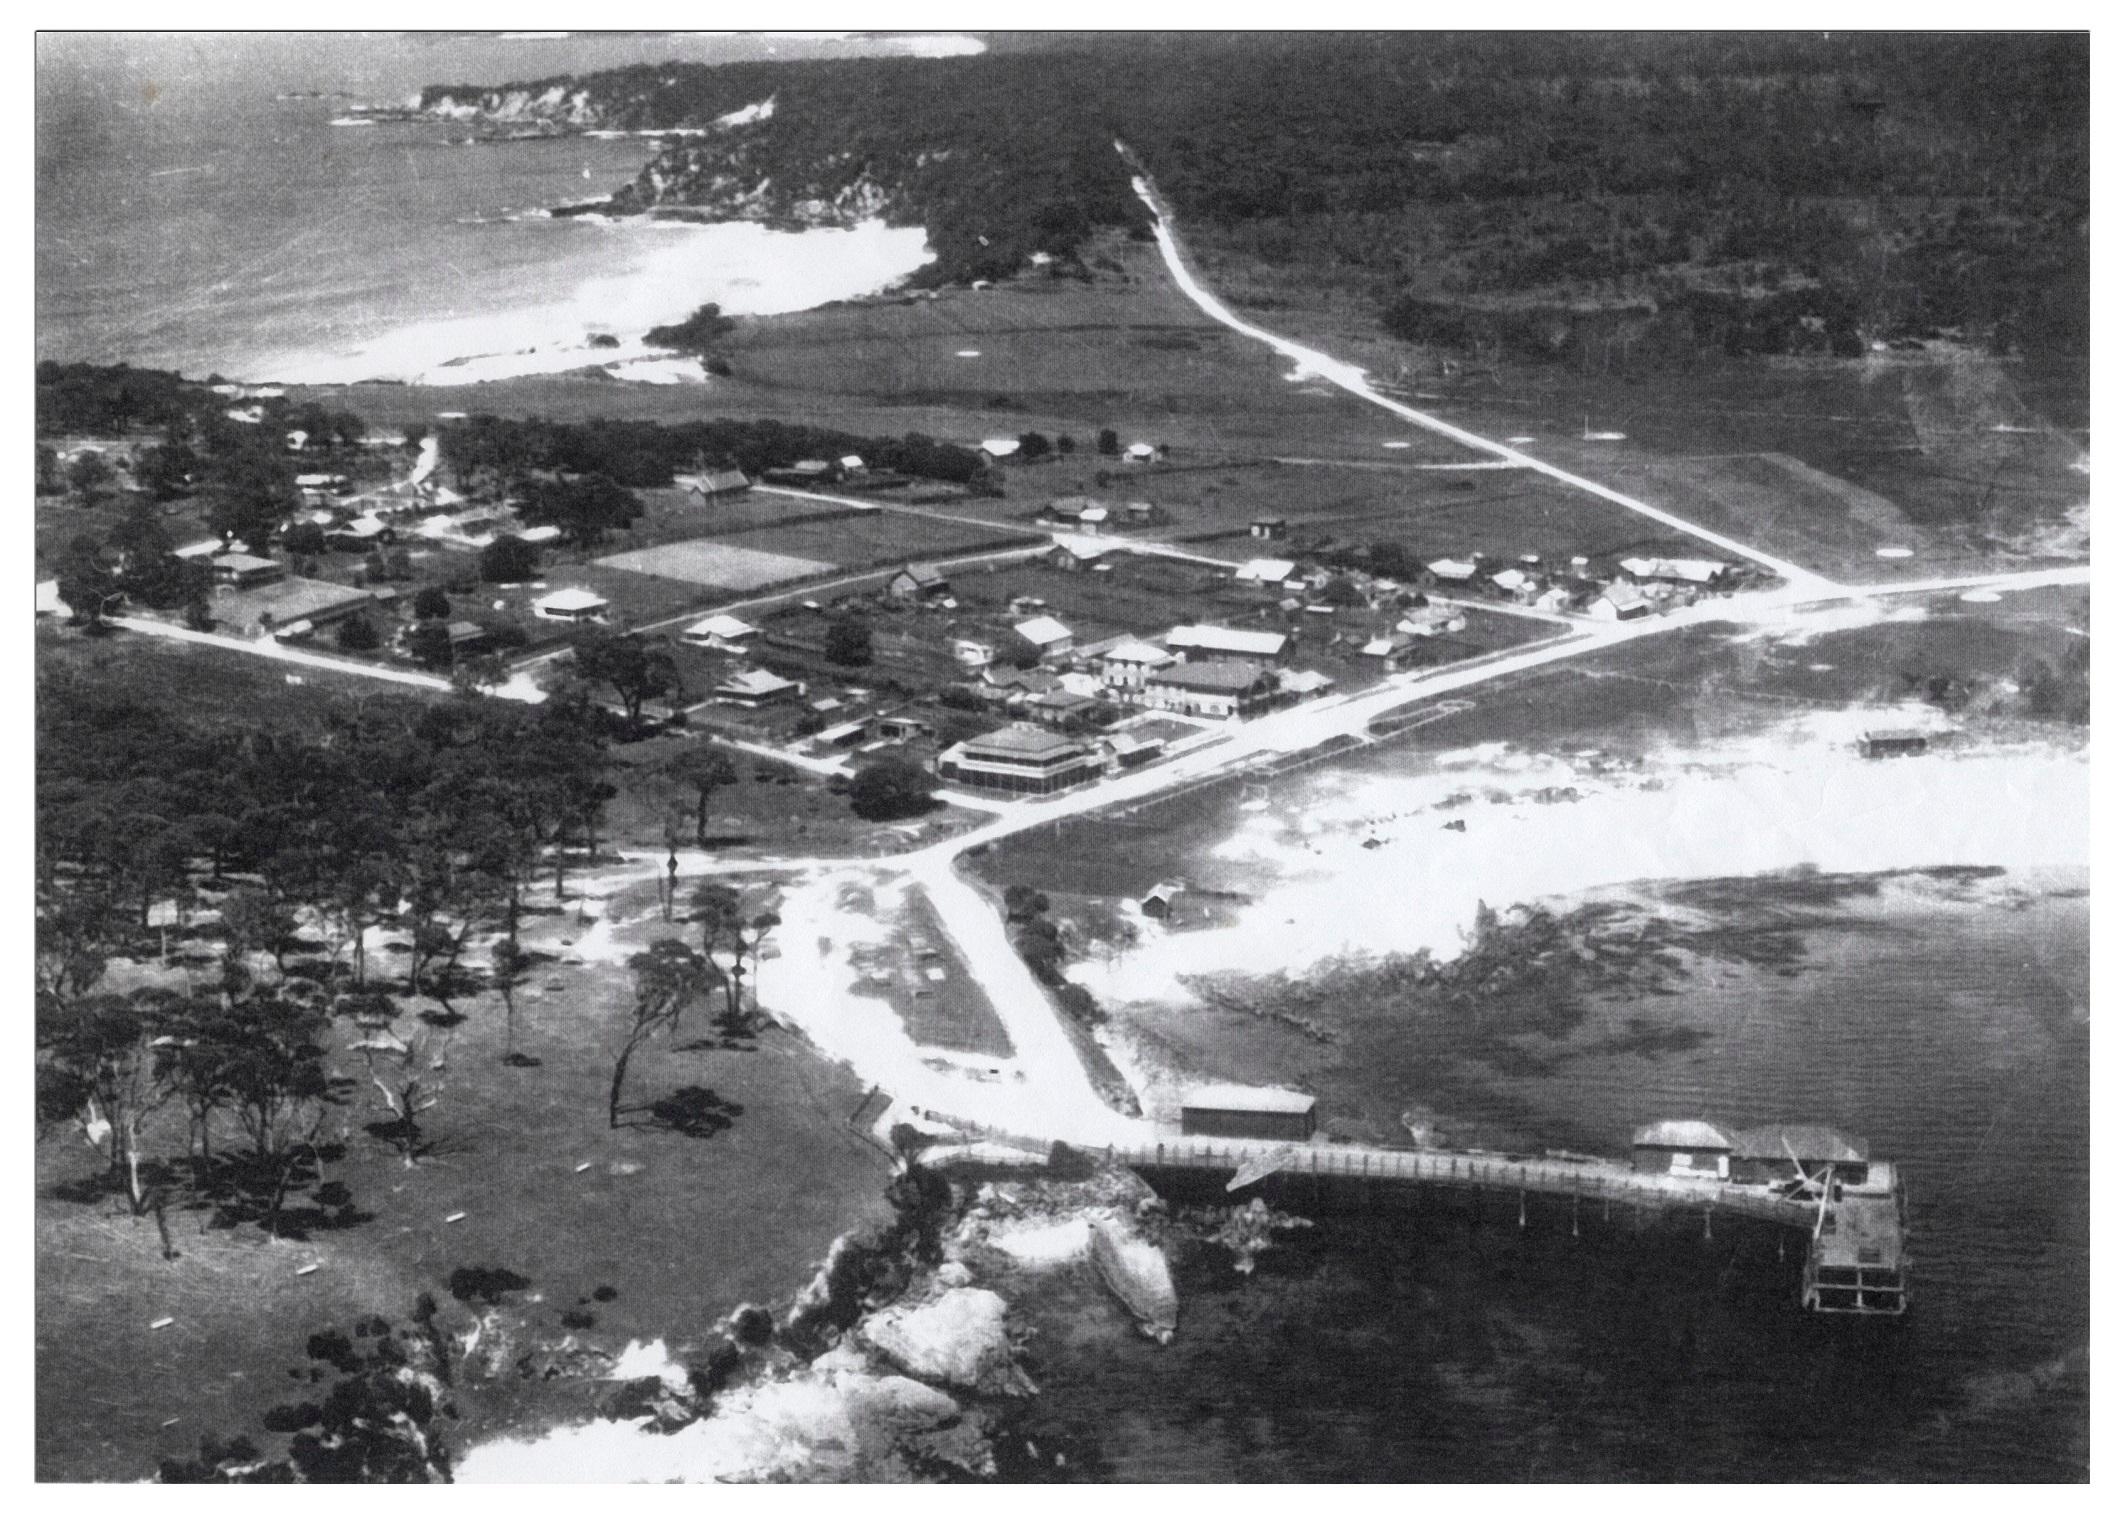 Heritage+Trail+Bermagui+aerial+circa+1940s.jpg